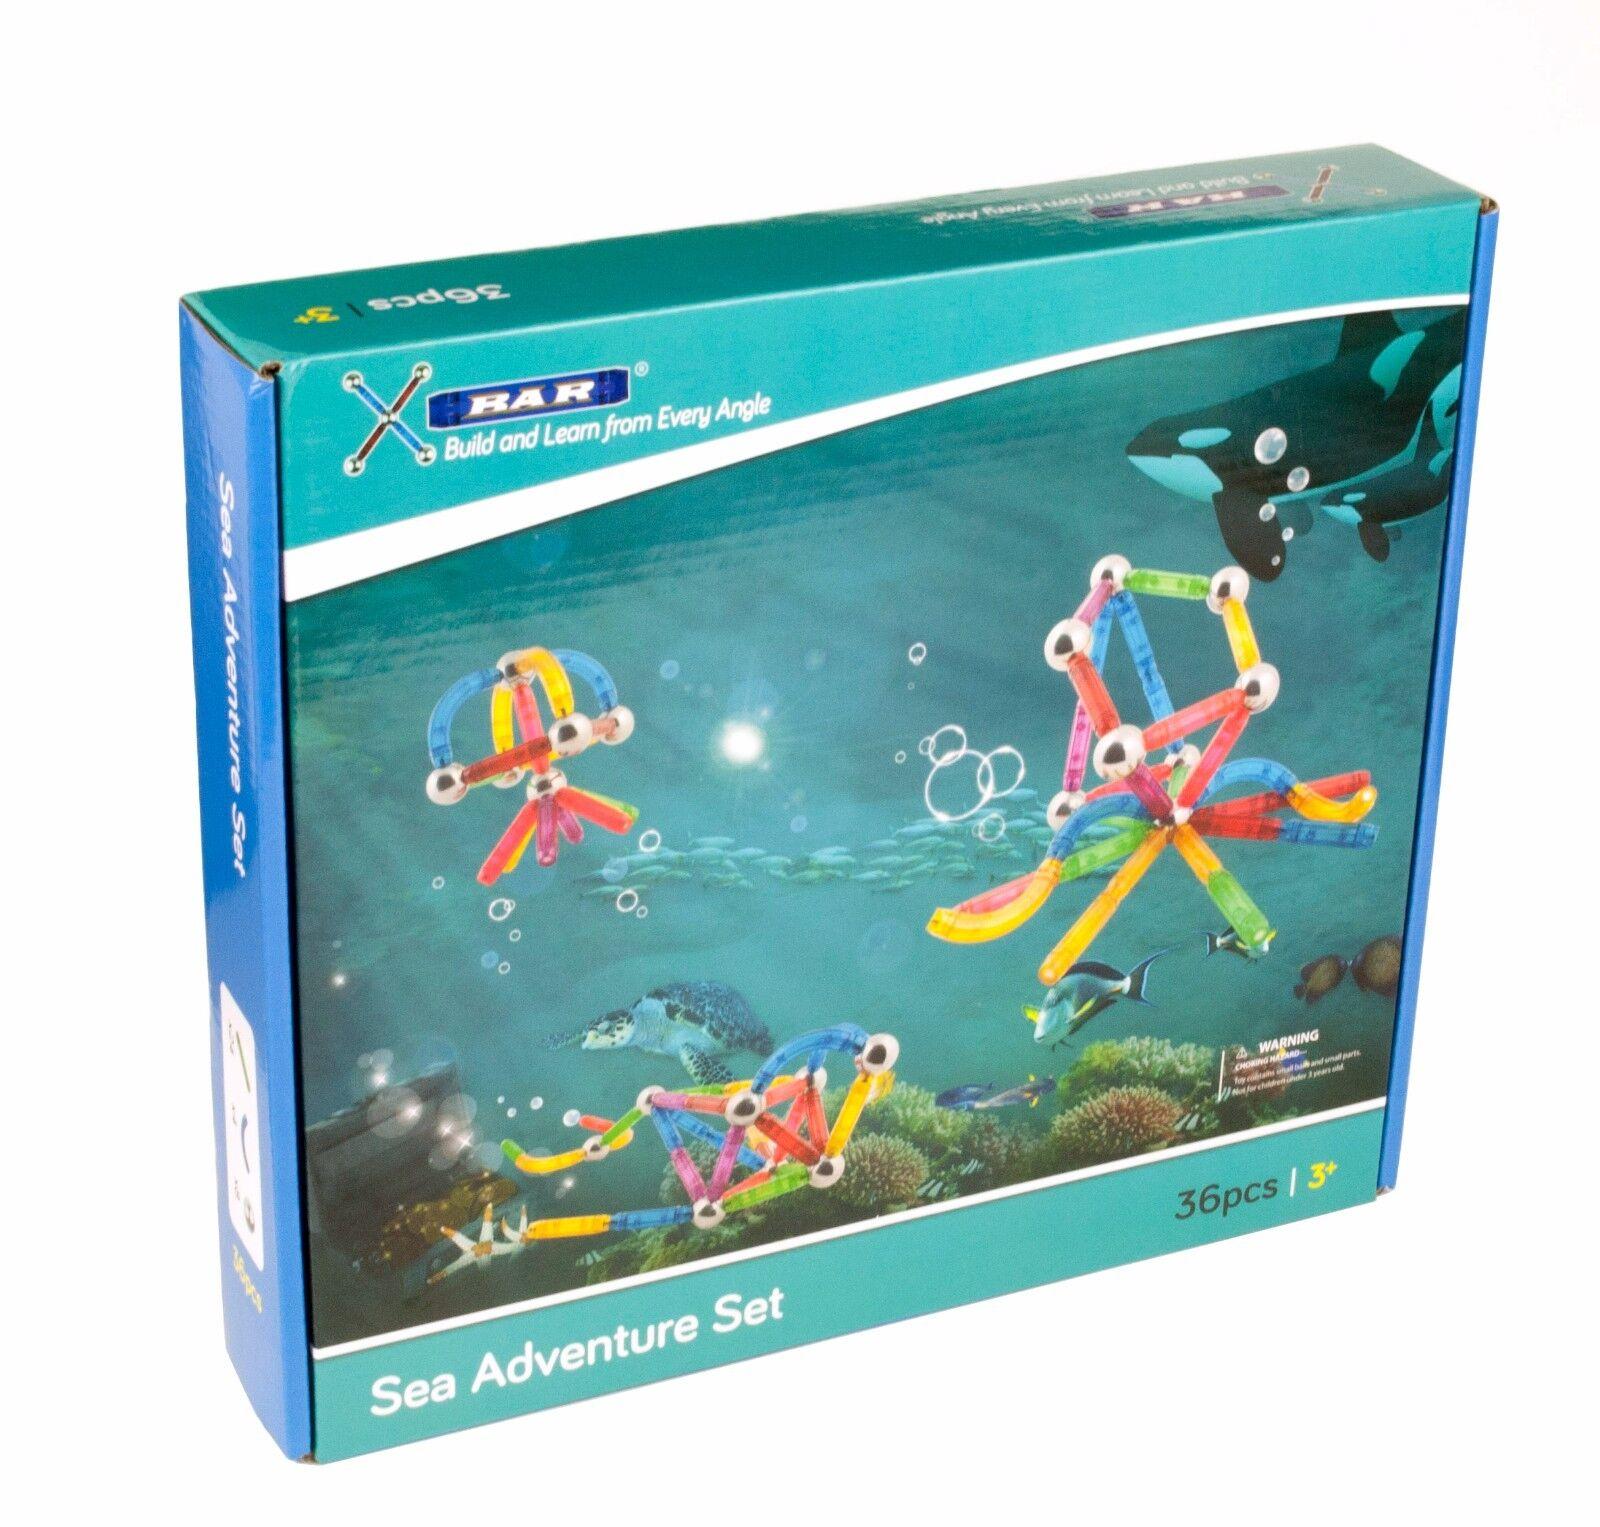 X-Bar Translucent Magnetic Bars and Steel Spheres, 36 Piece Piece Piece Sea Adventure Set 86c9e6